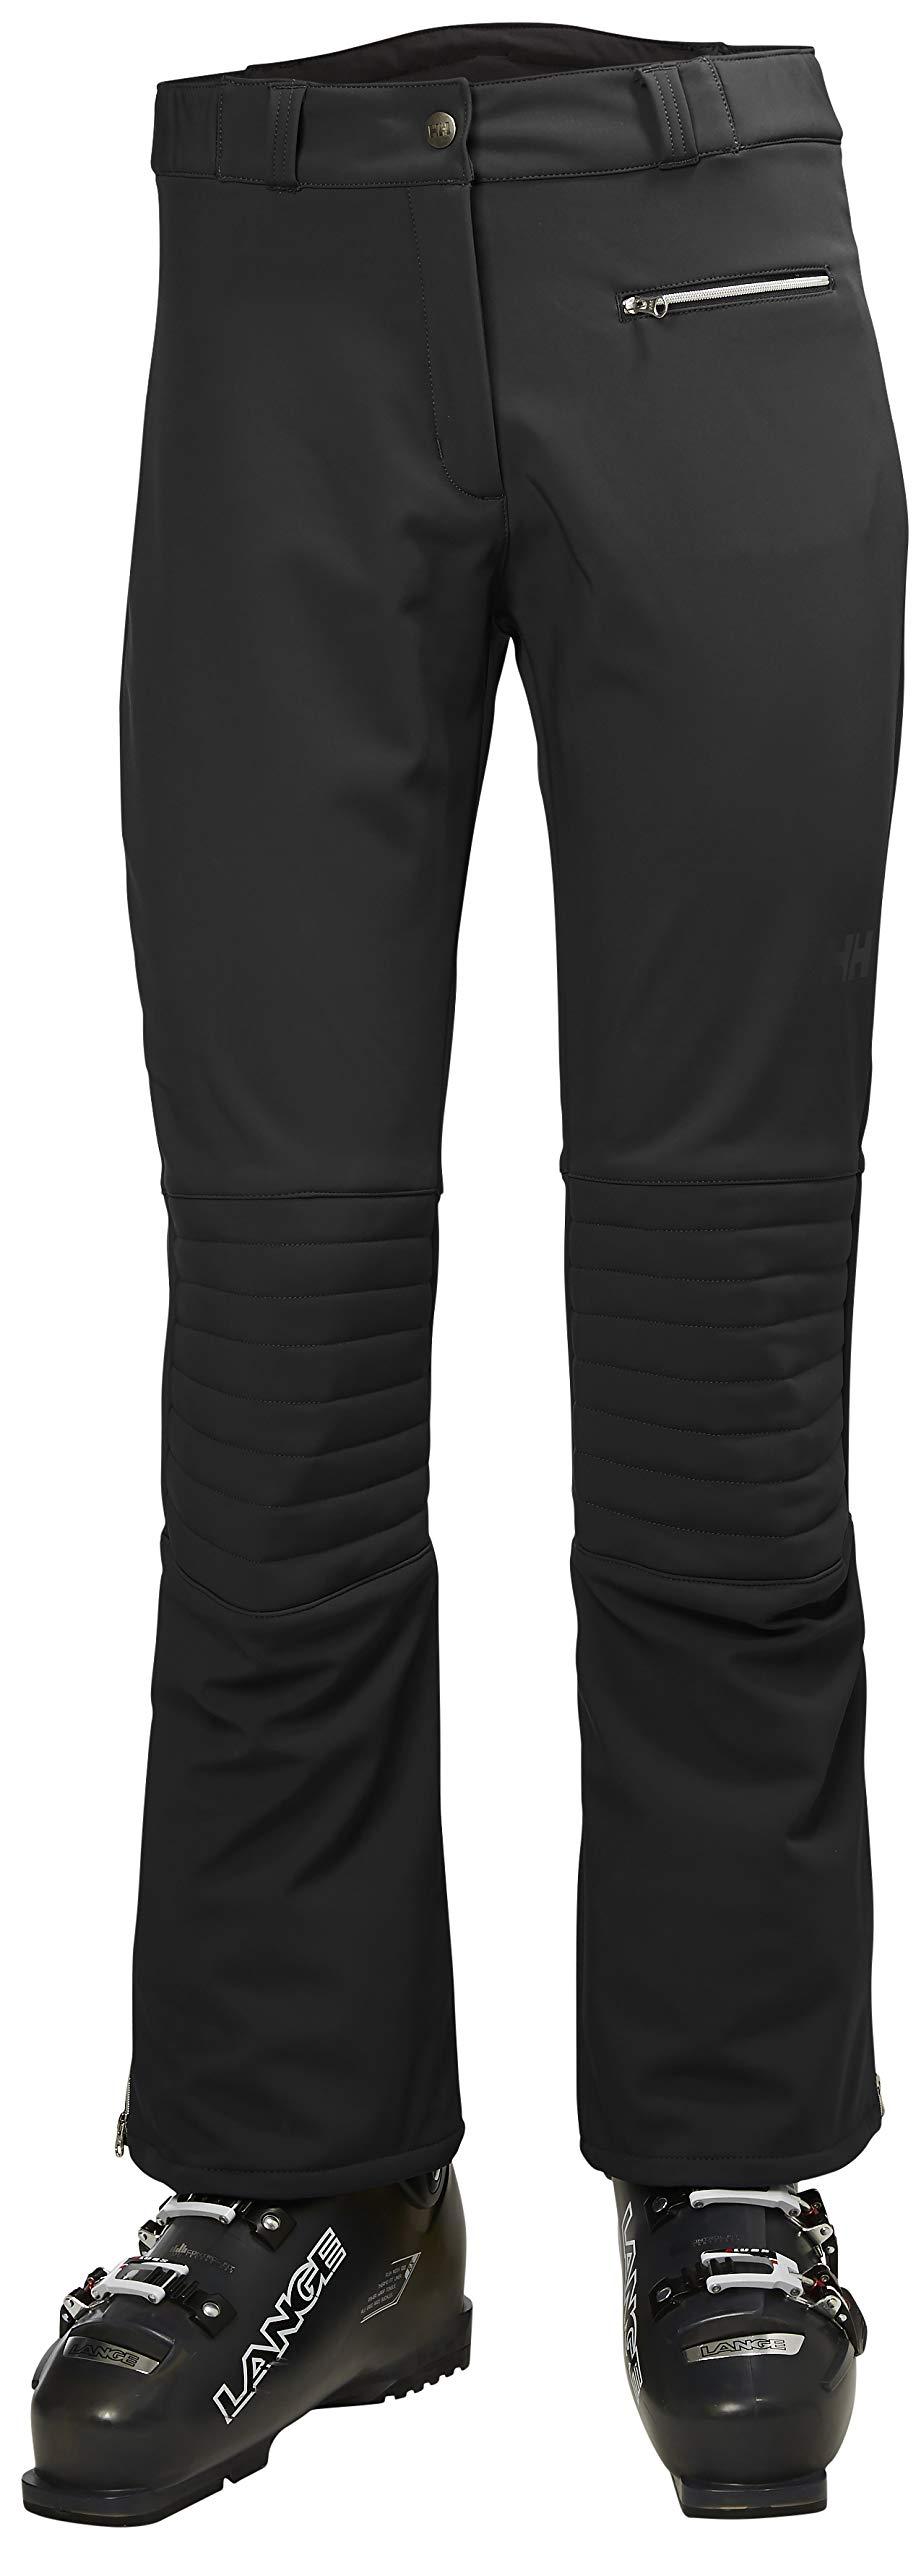 Helly-Hansen 65561 Women's Bellissimo Pant